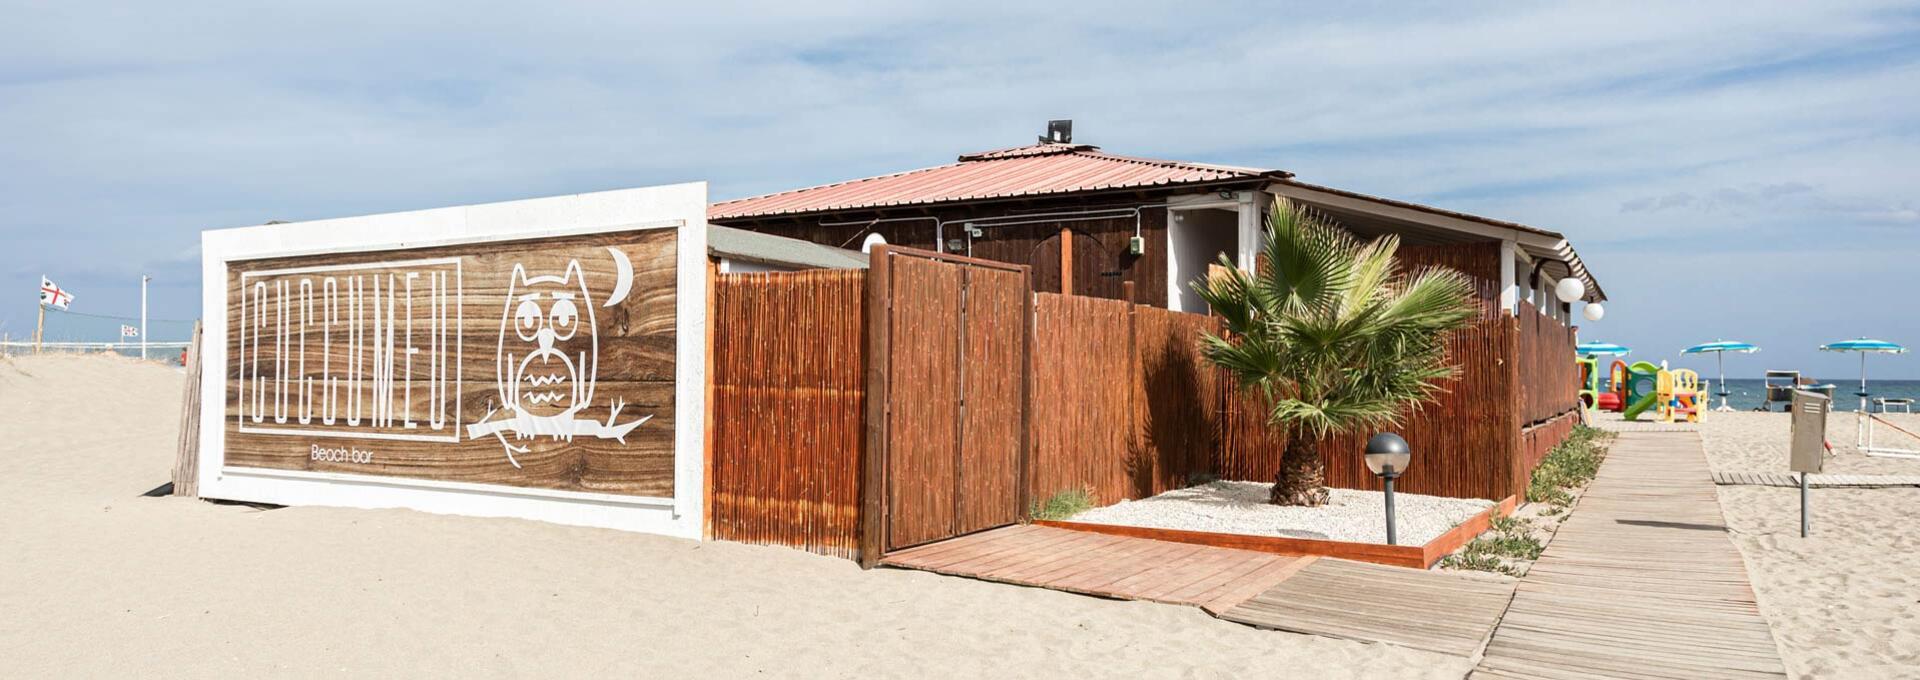 4mori en resort-by-the-sea-sardinia 019